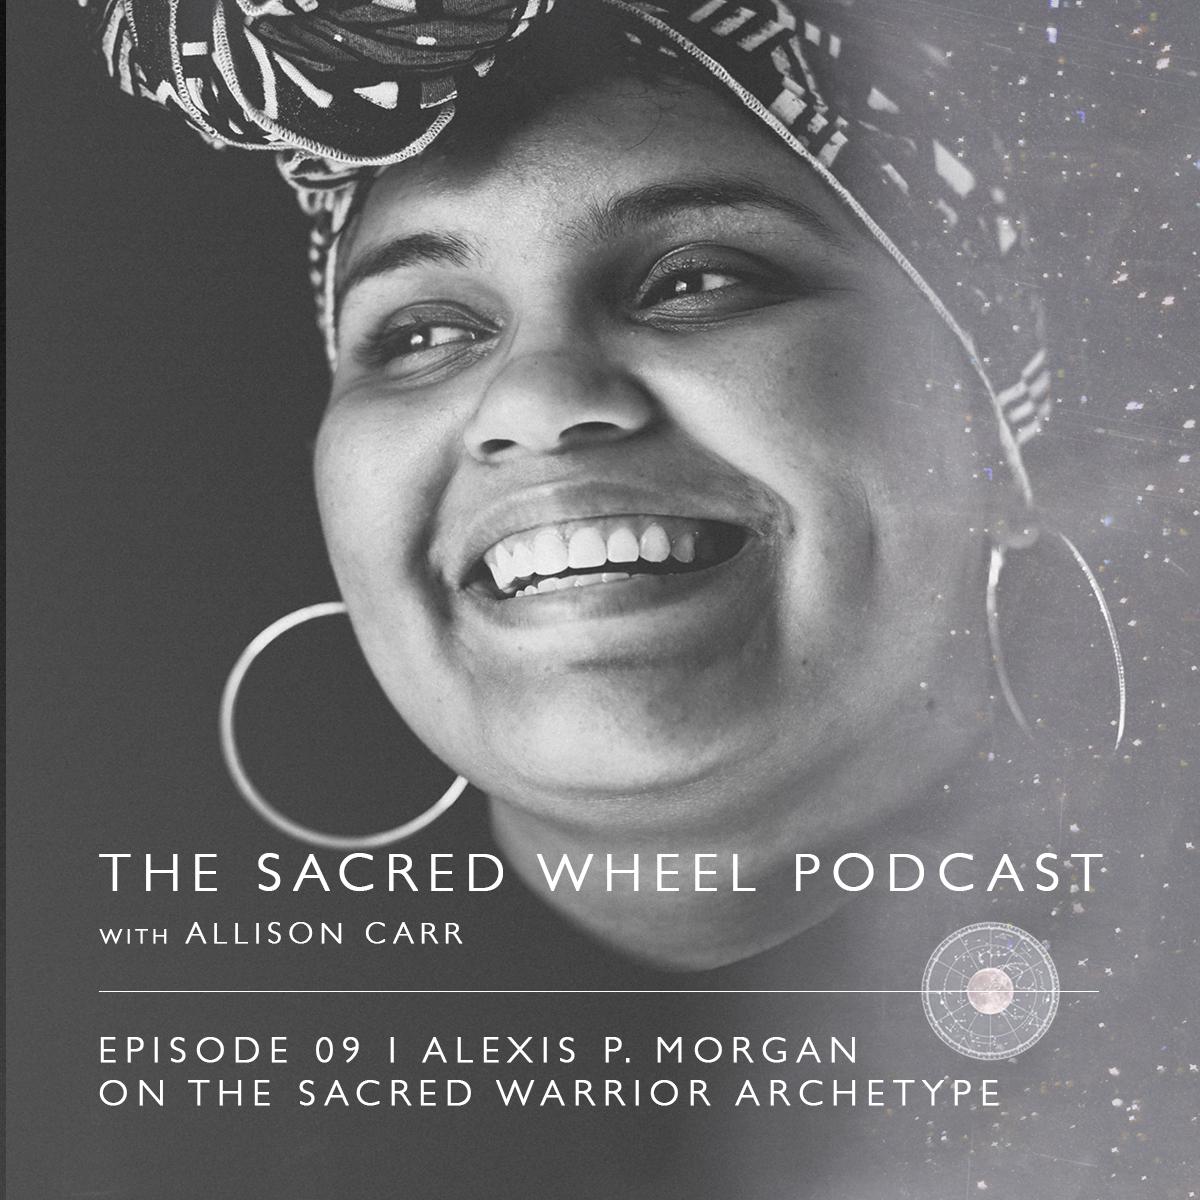 Alexis P. Morgan: On the Sacred Warrior Archetype